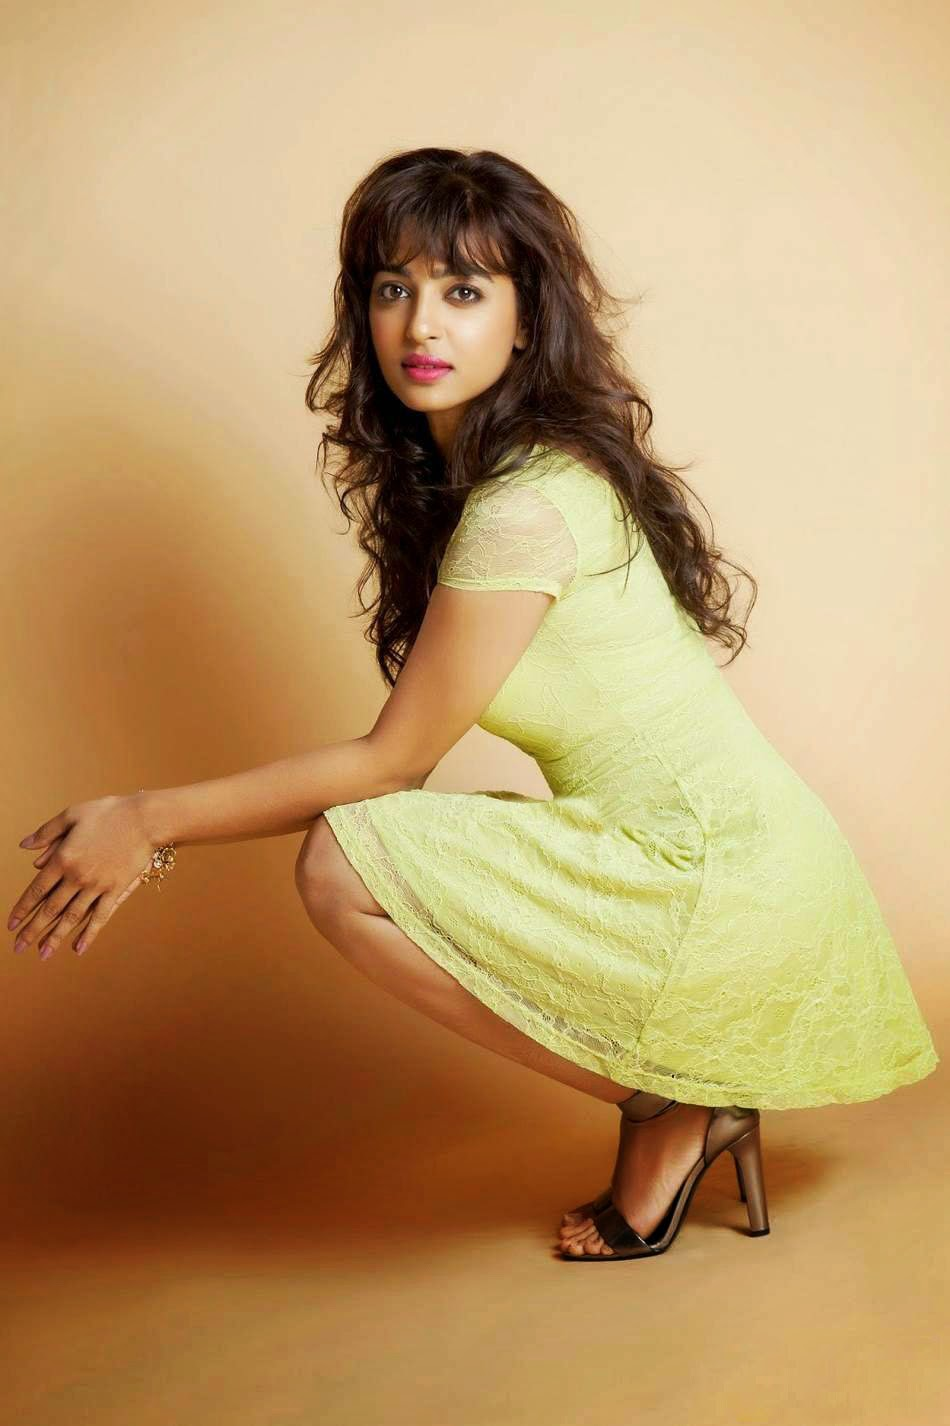 radhika-apte-sexy-stills